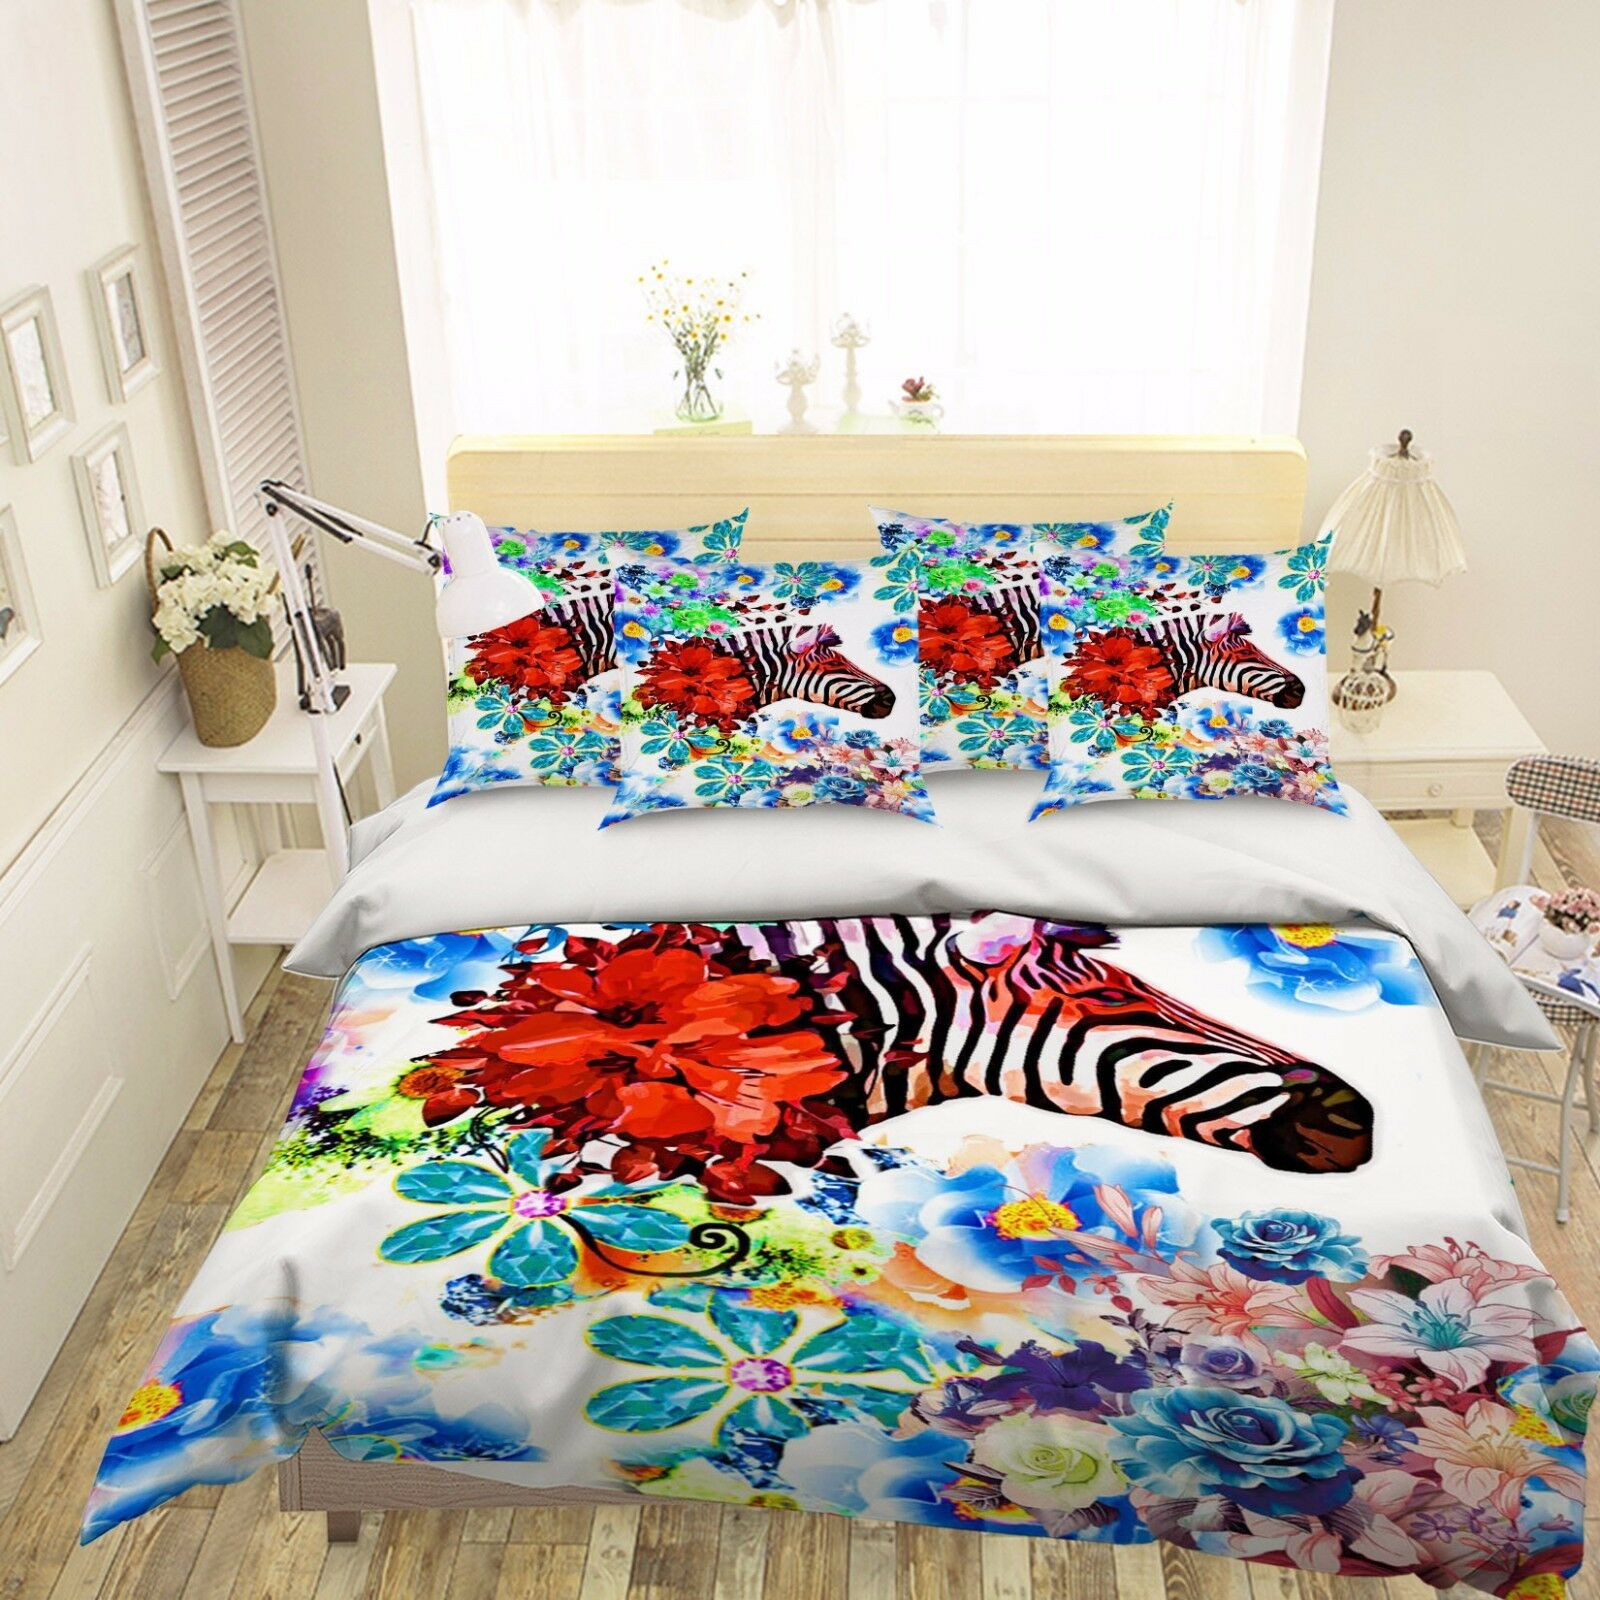 3D Zebra Watercolors 53 Bed Pillowcases Quilt Duvet Cover Set Single Queen CA